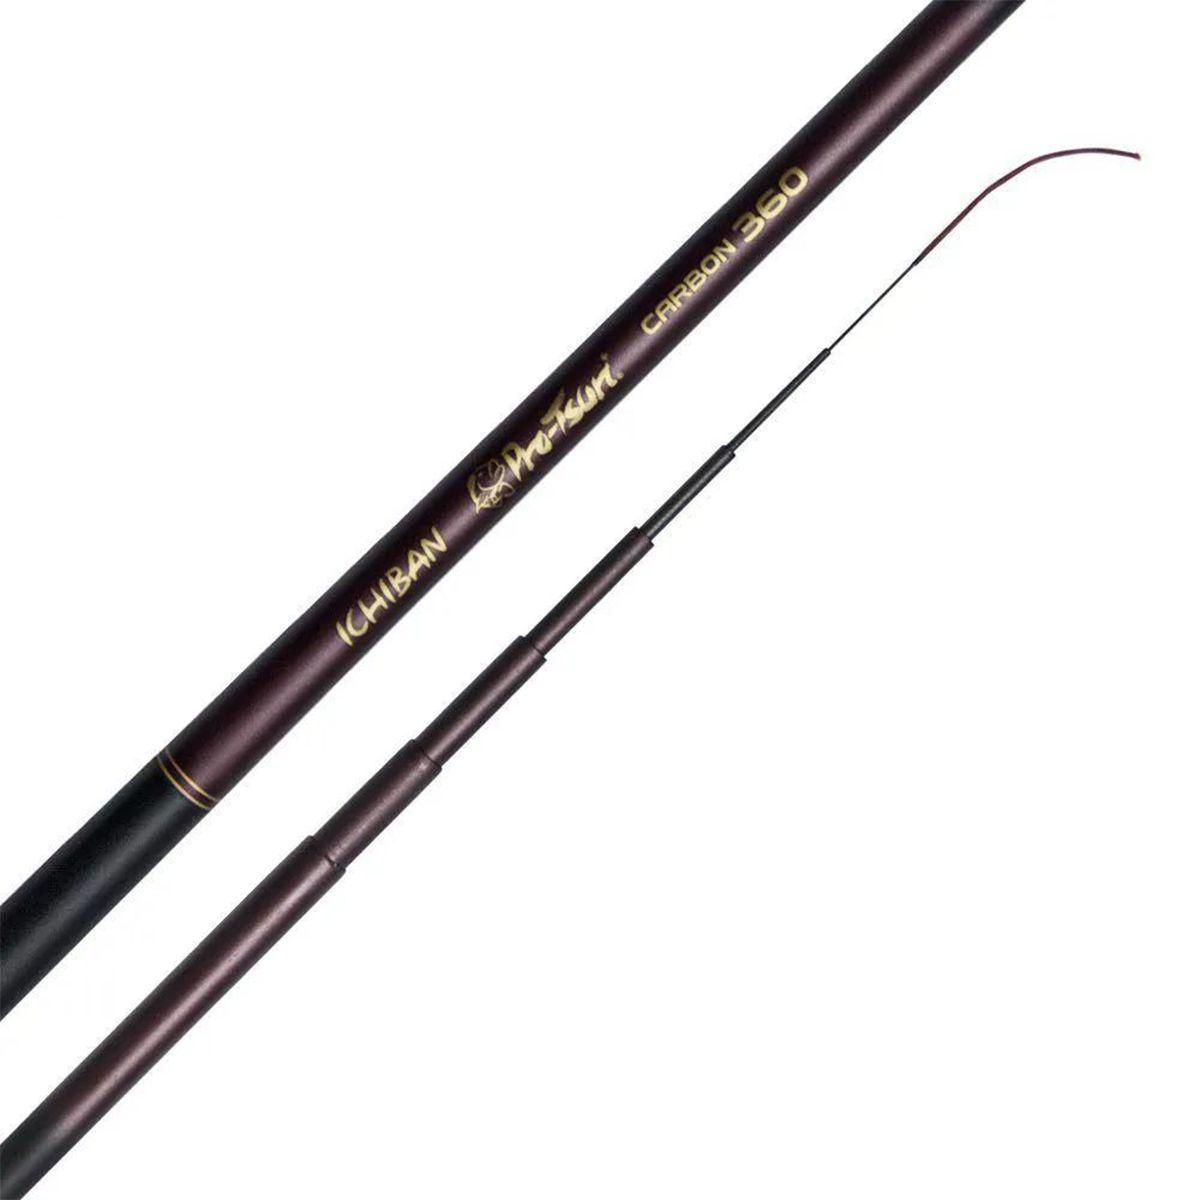 Vara Pro Tsuri Ichiban Carbono 3.60m - Telescópica